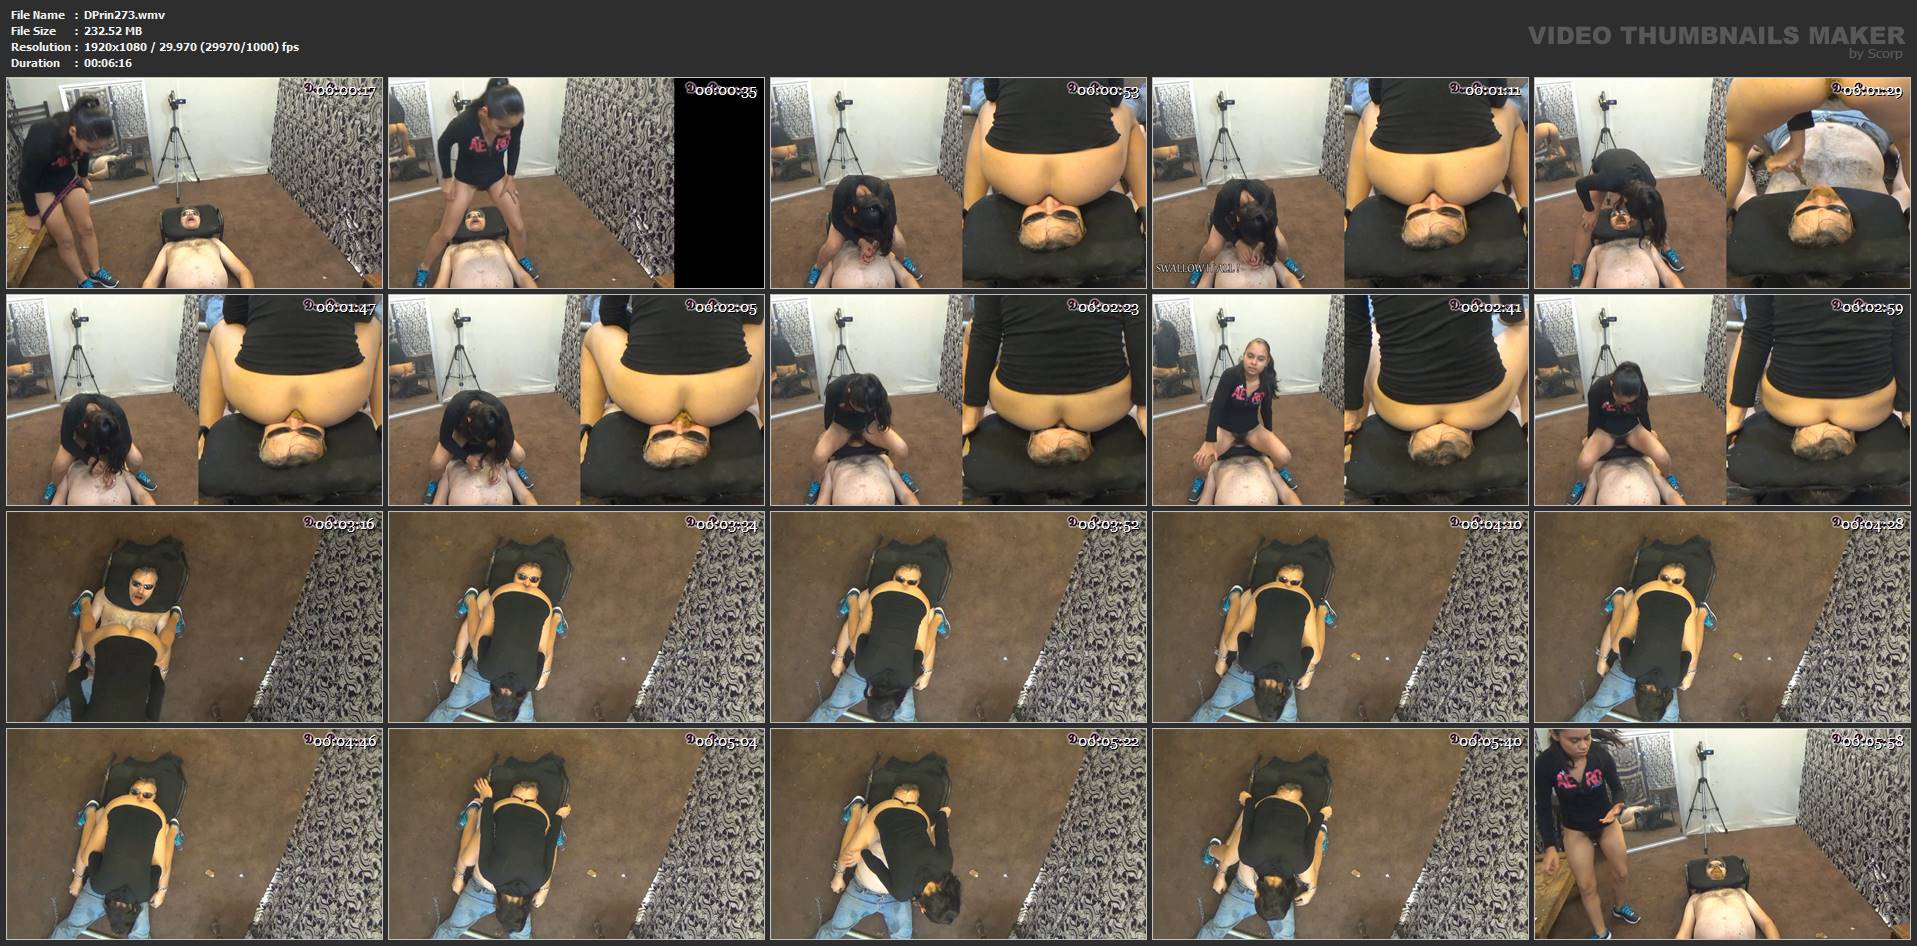 [DOM-PRINCESS] Toilet Slave on Duty Part 7 Karinas Best Friend [FULL HD][1080p][WMV]